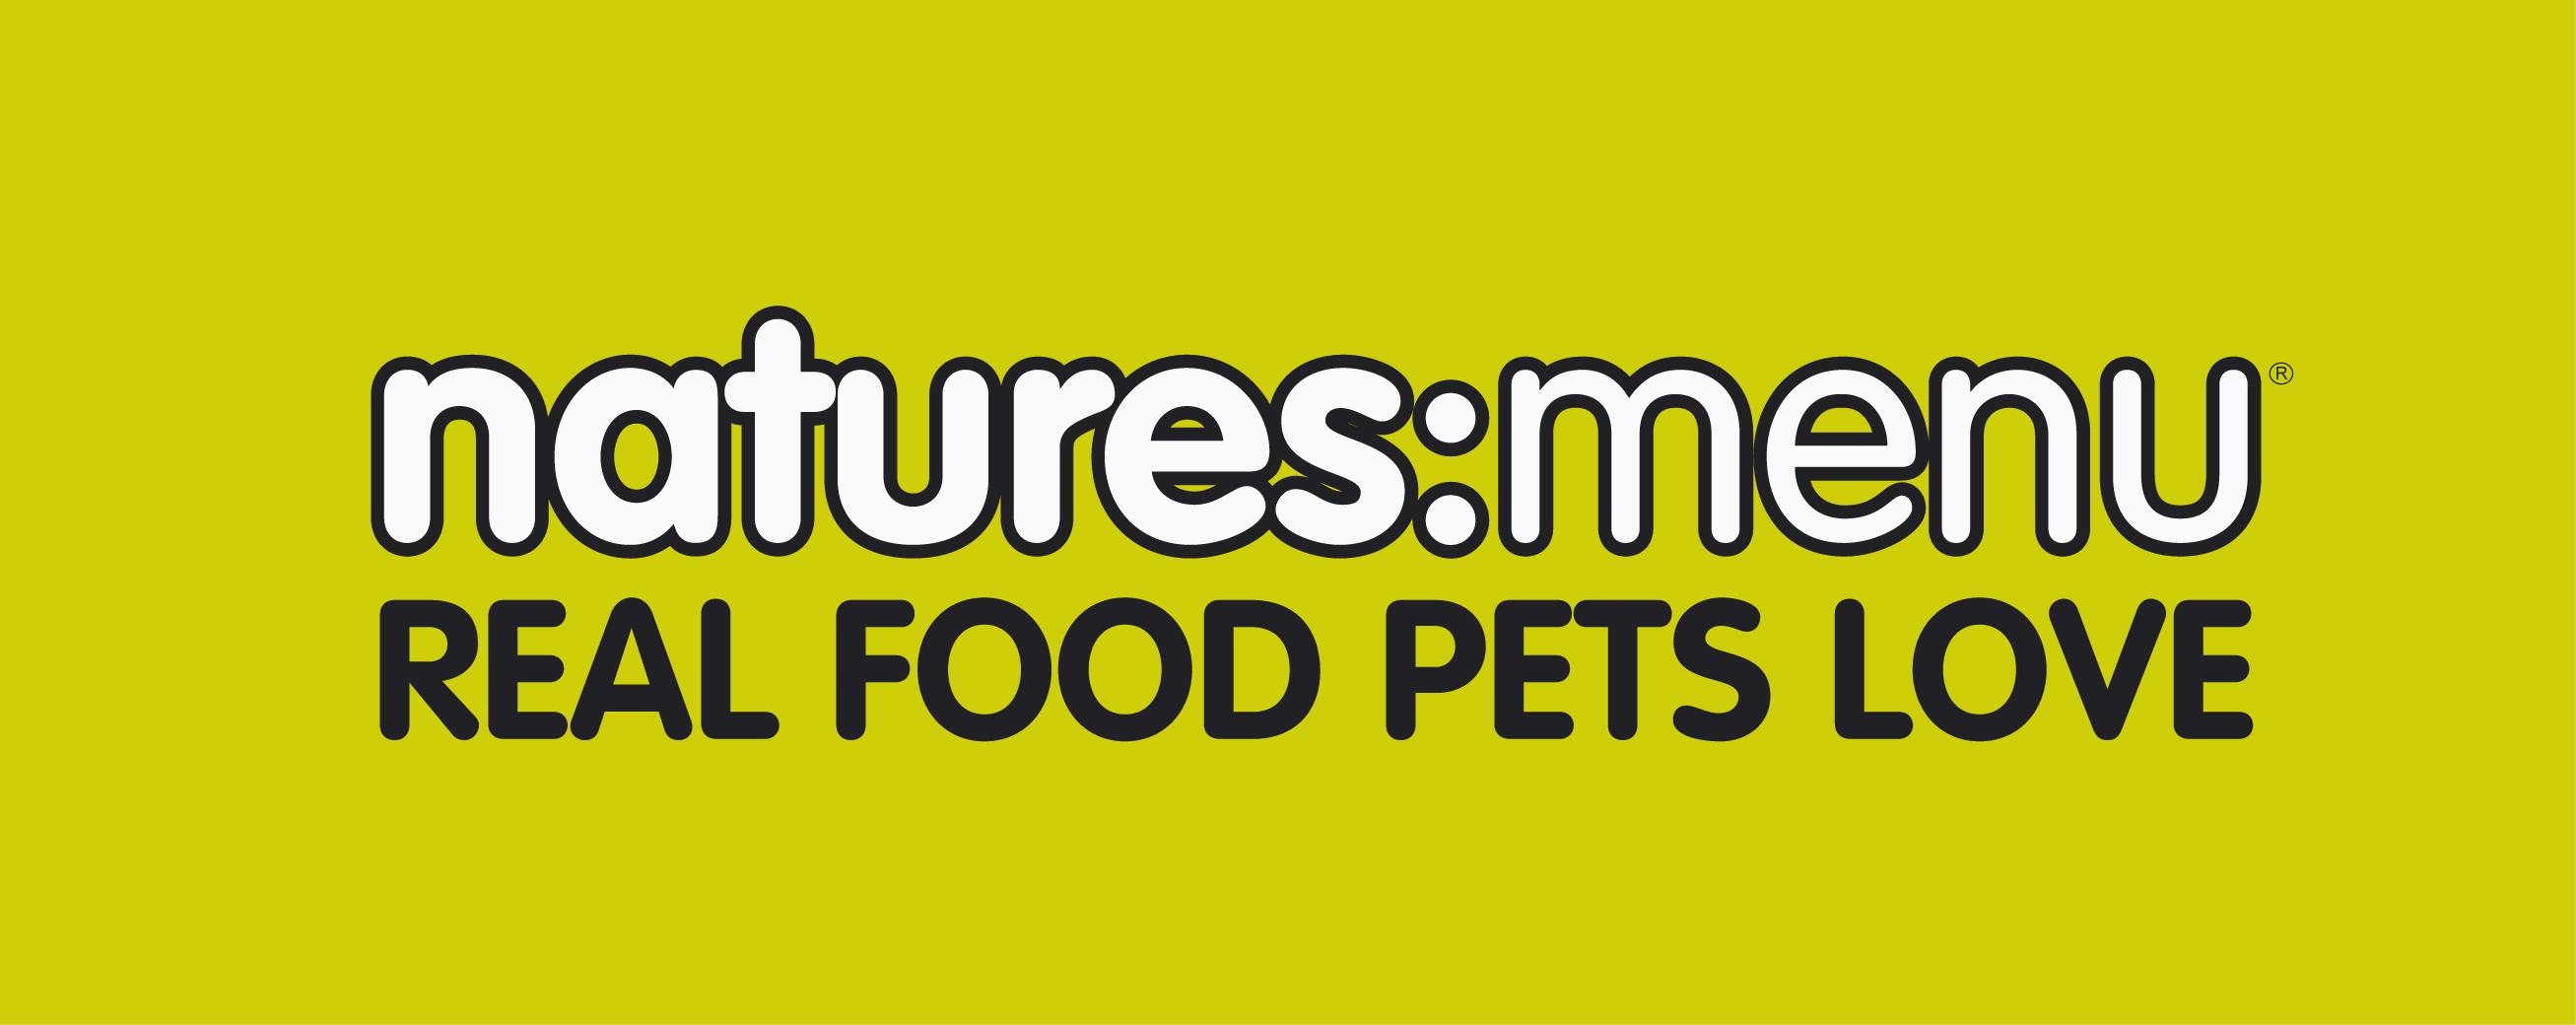 https://static1.viovet.co.uk/opt/s=kr/embedded/1344005318_8958nm_logo-real-food-pets-love.jpg